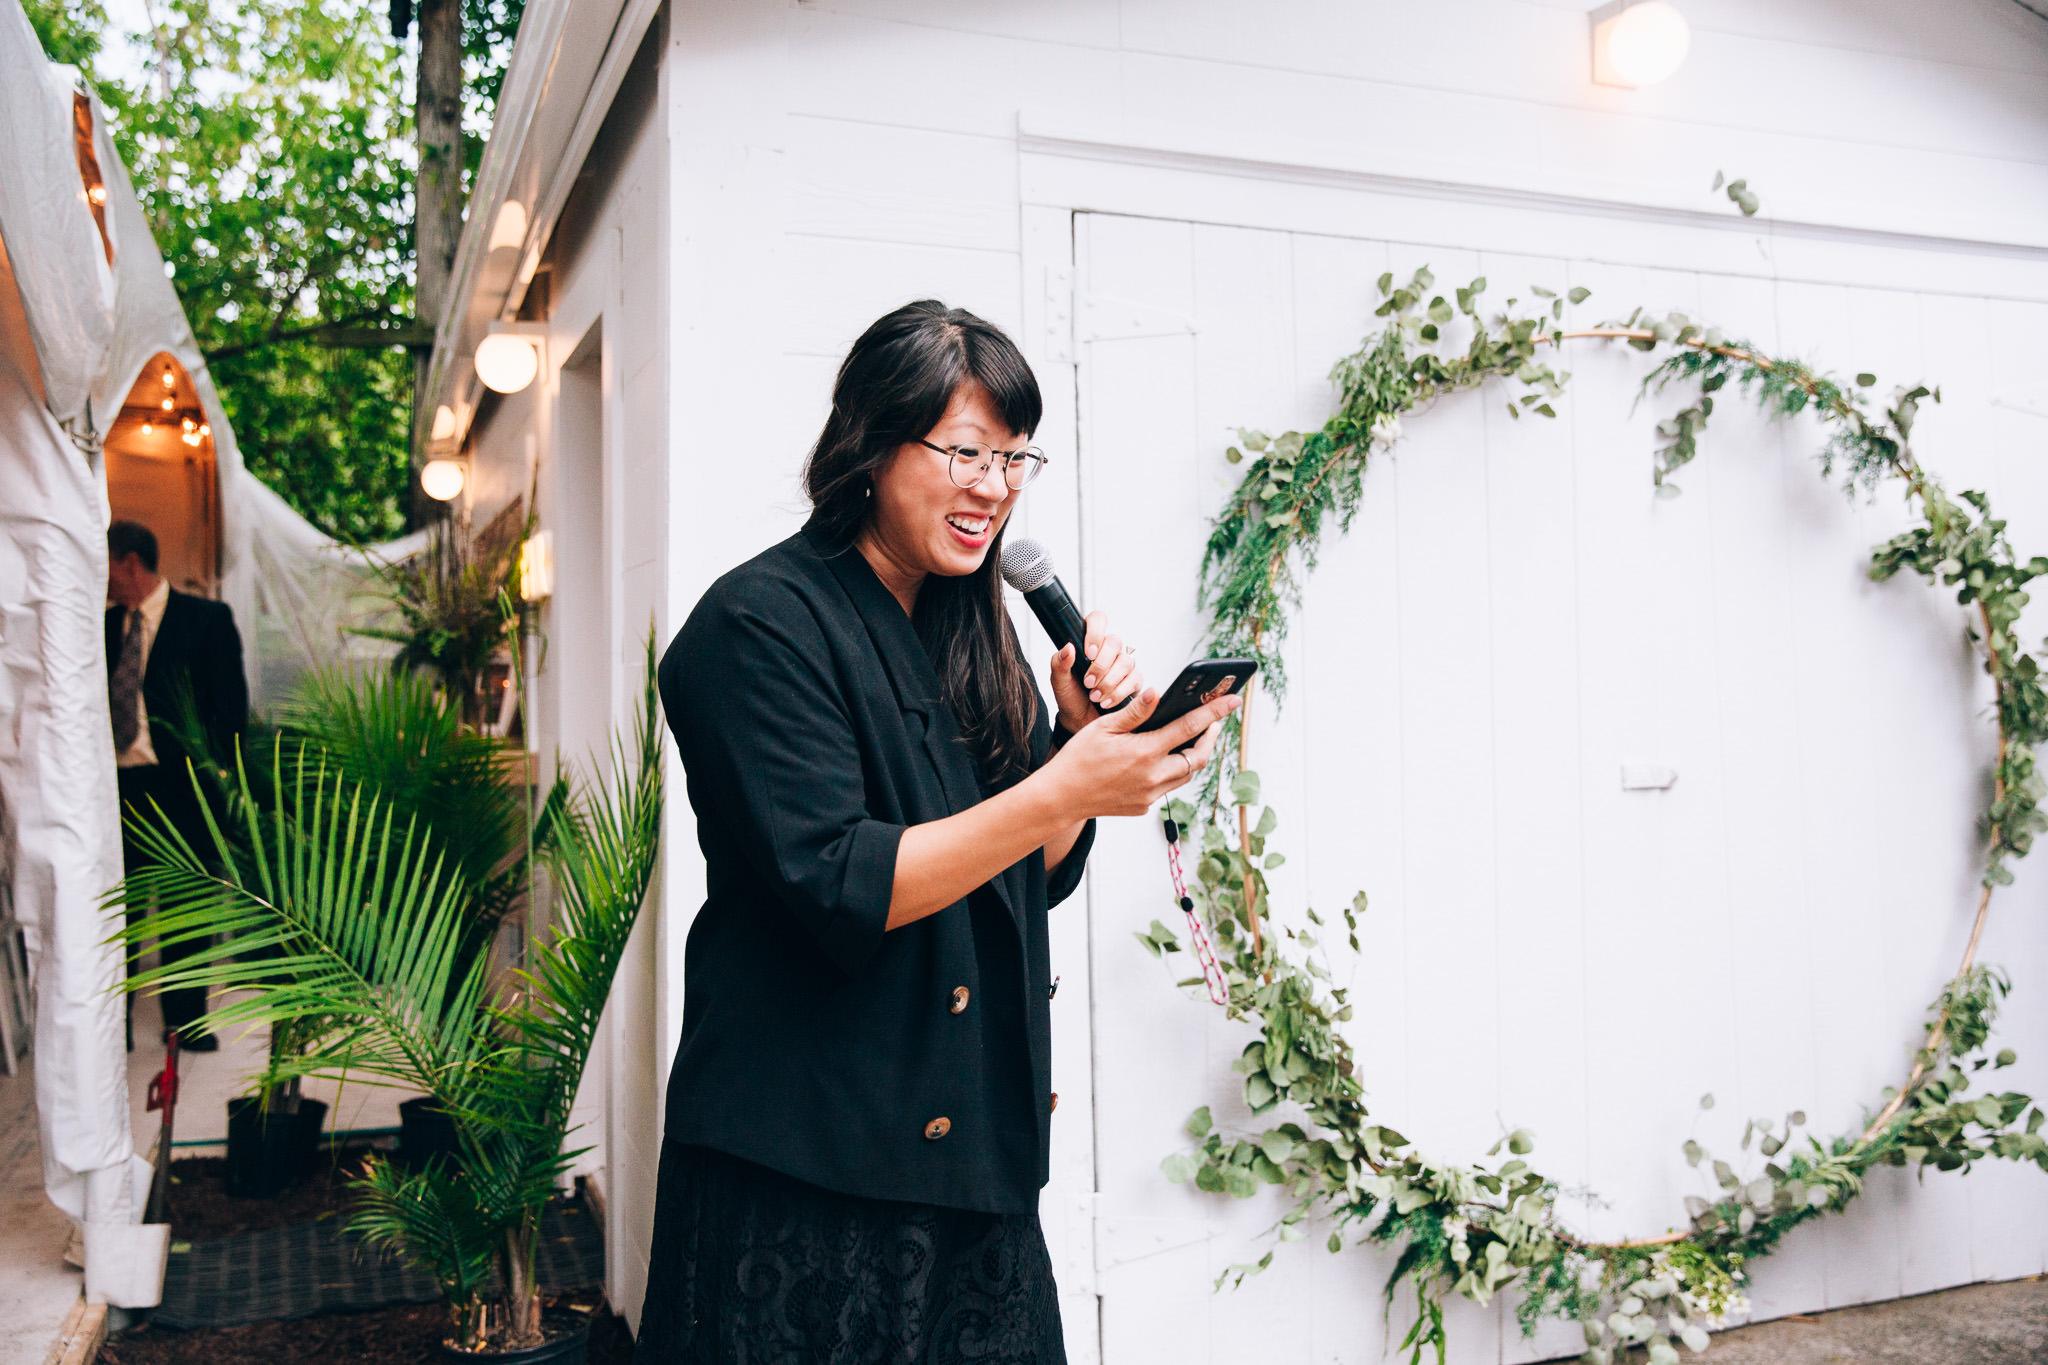 063_Canada-documentary-wedding-photograp